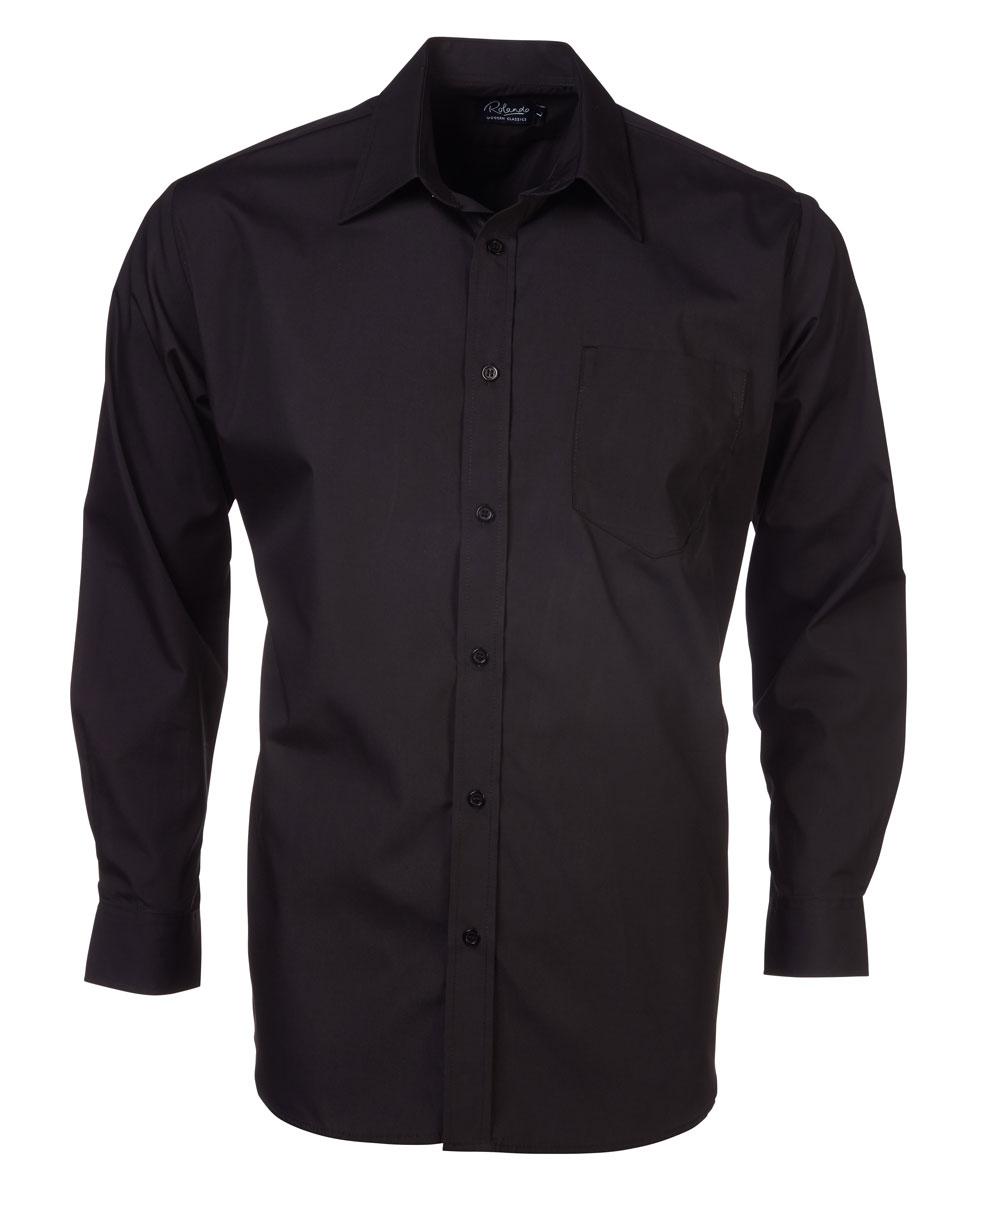 Mens P070 S/s Shirt - Black